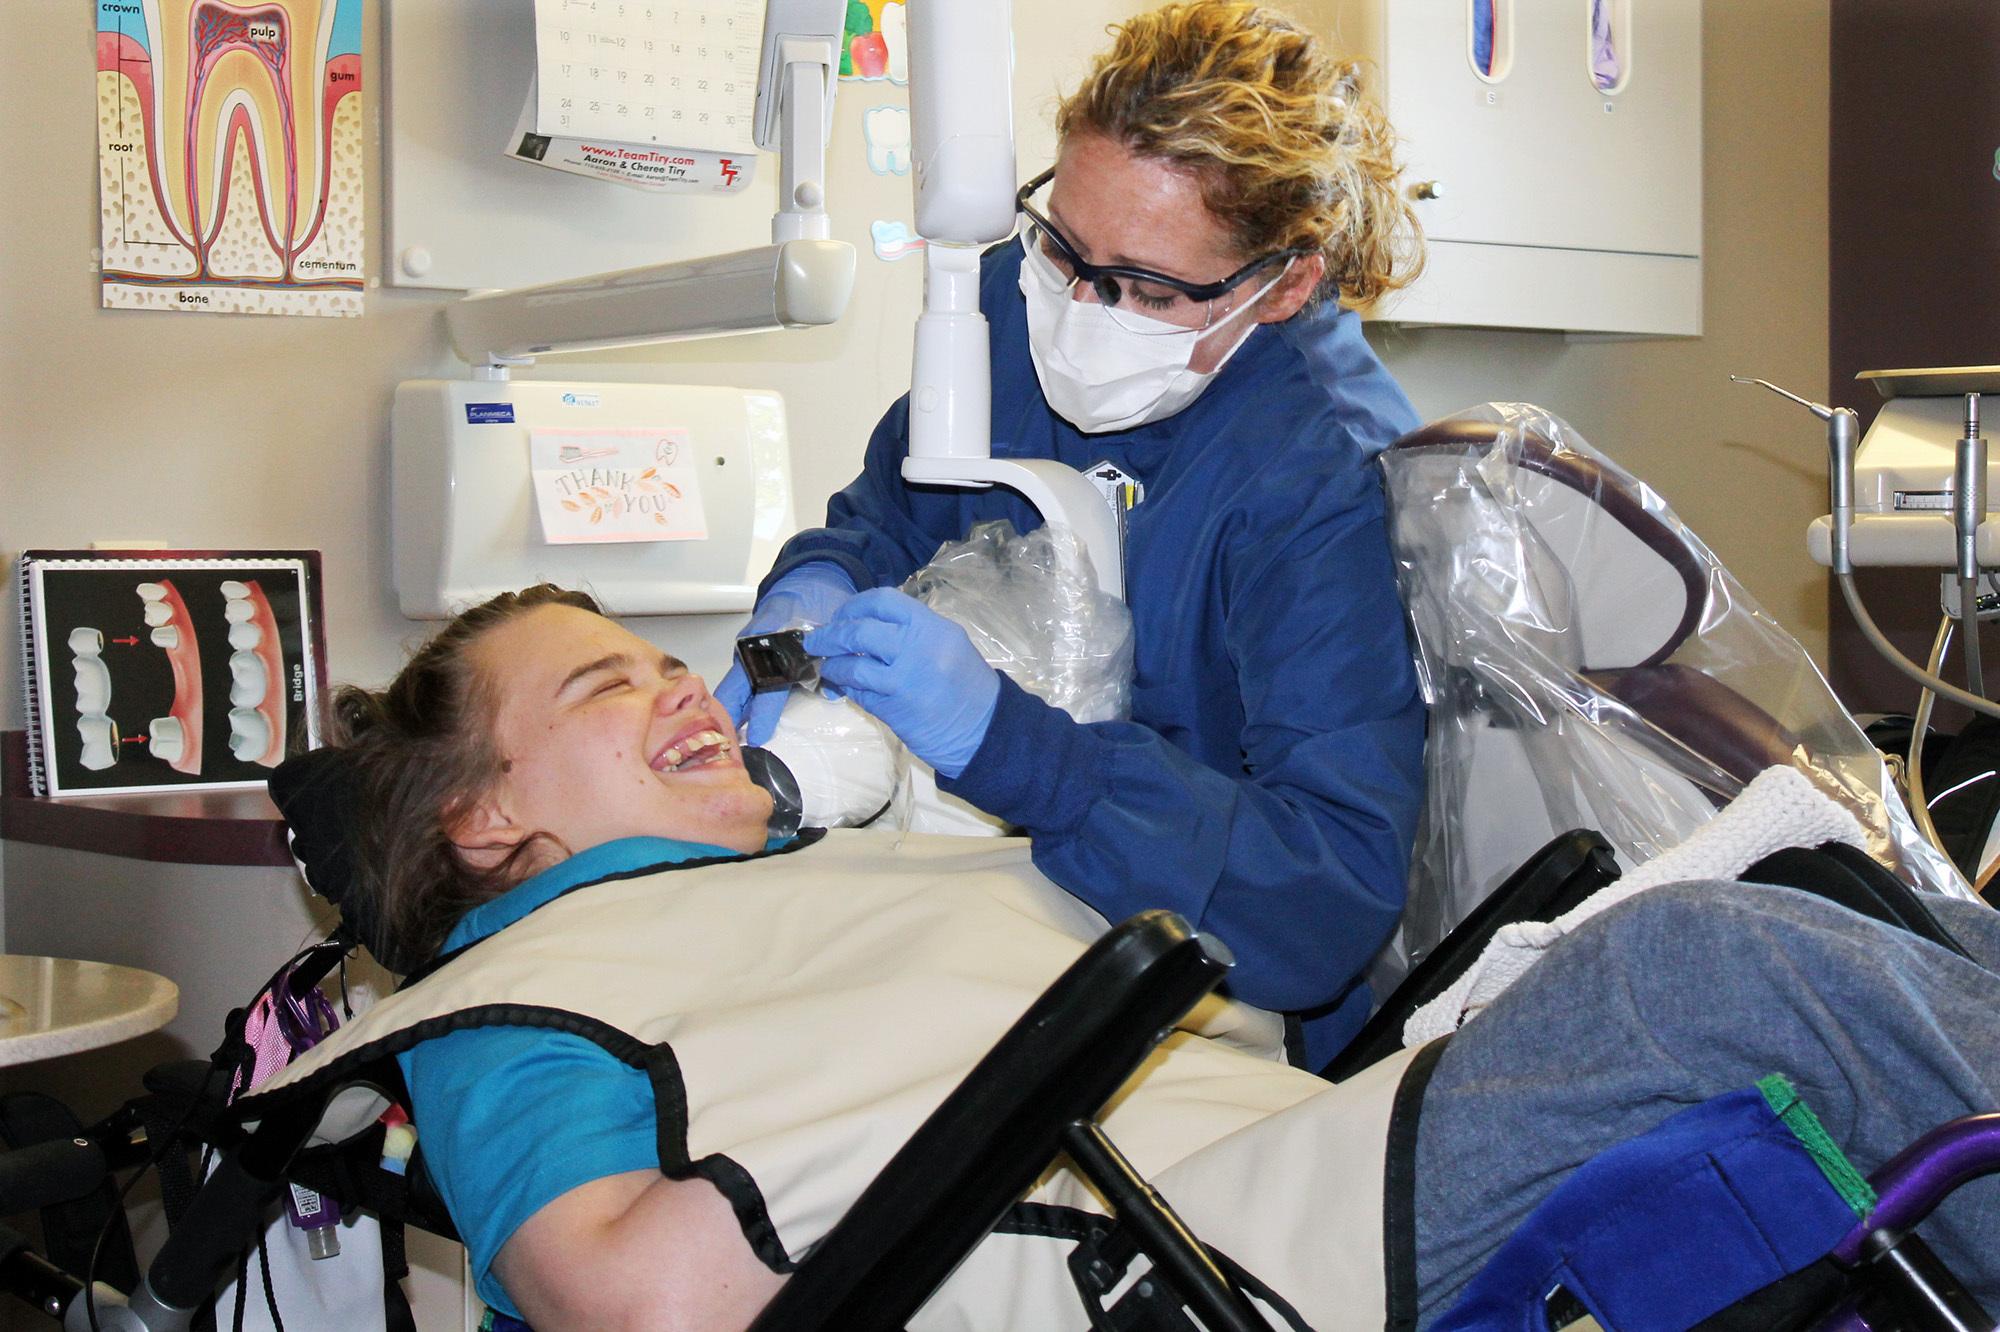 disabled-dentistry-2_enl-a0a03e4b36947a9856352ddd08008804c2c0b5e9.jpg